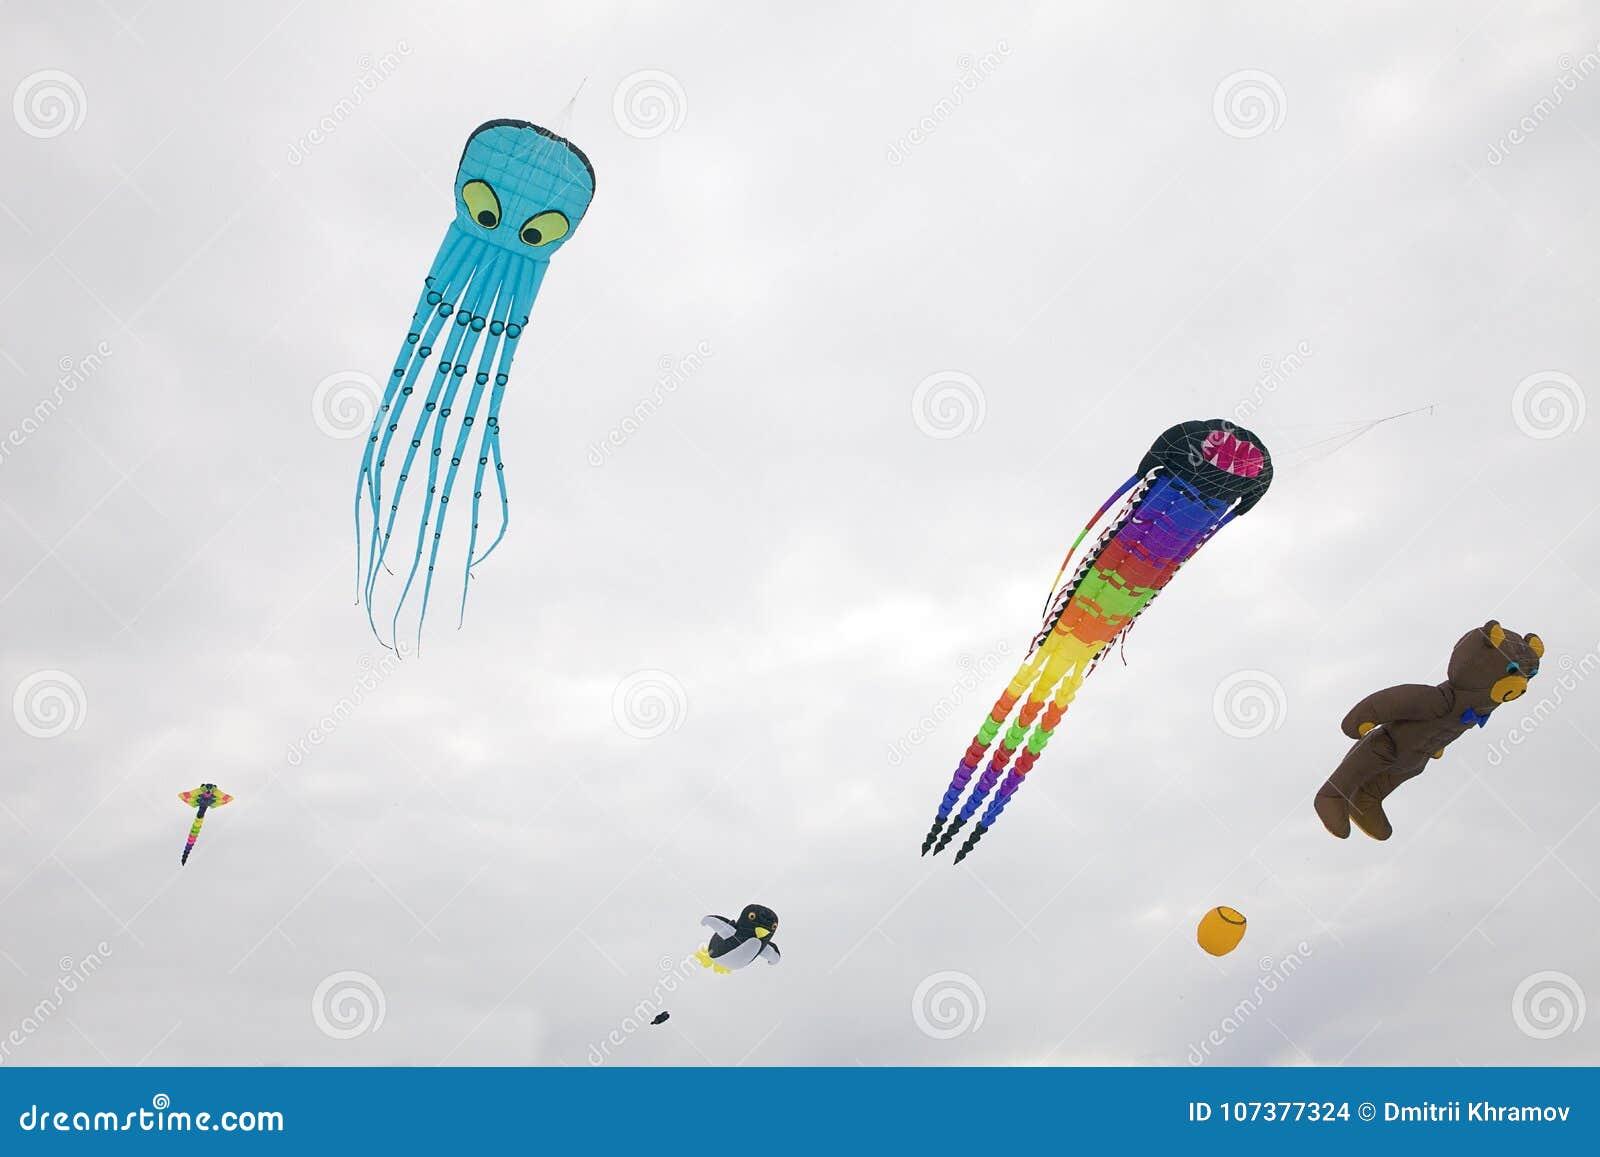 Show of kites against background of light sky